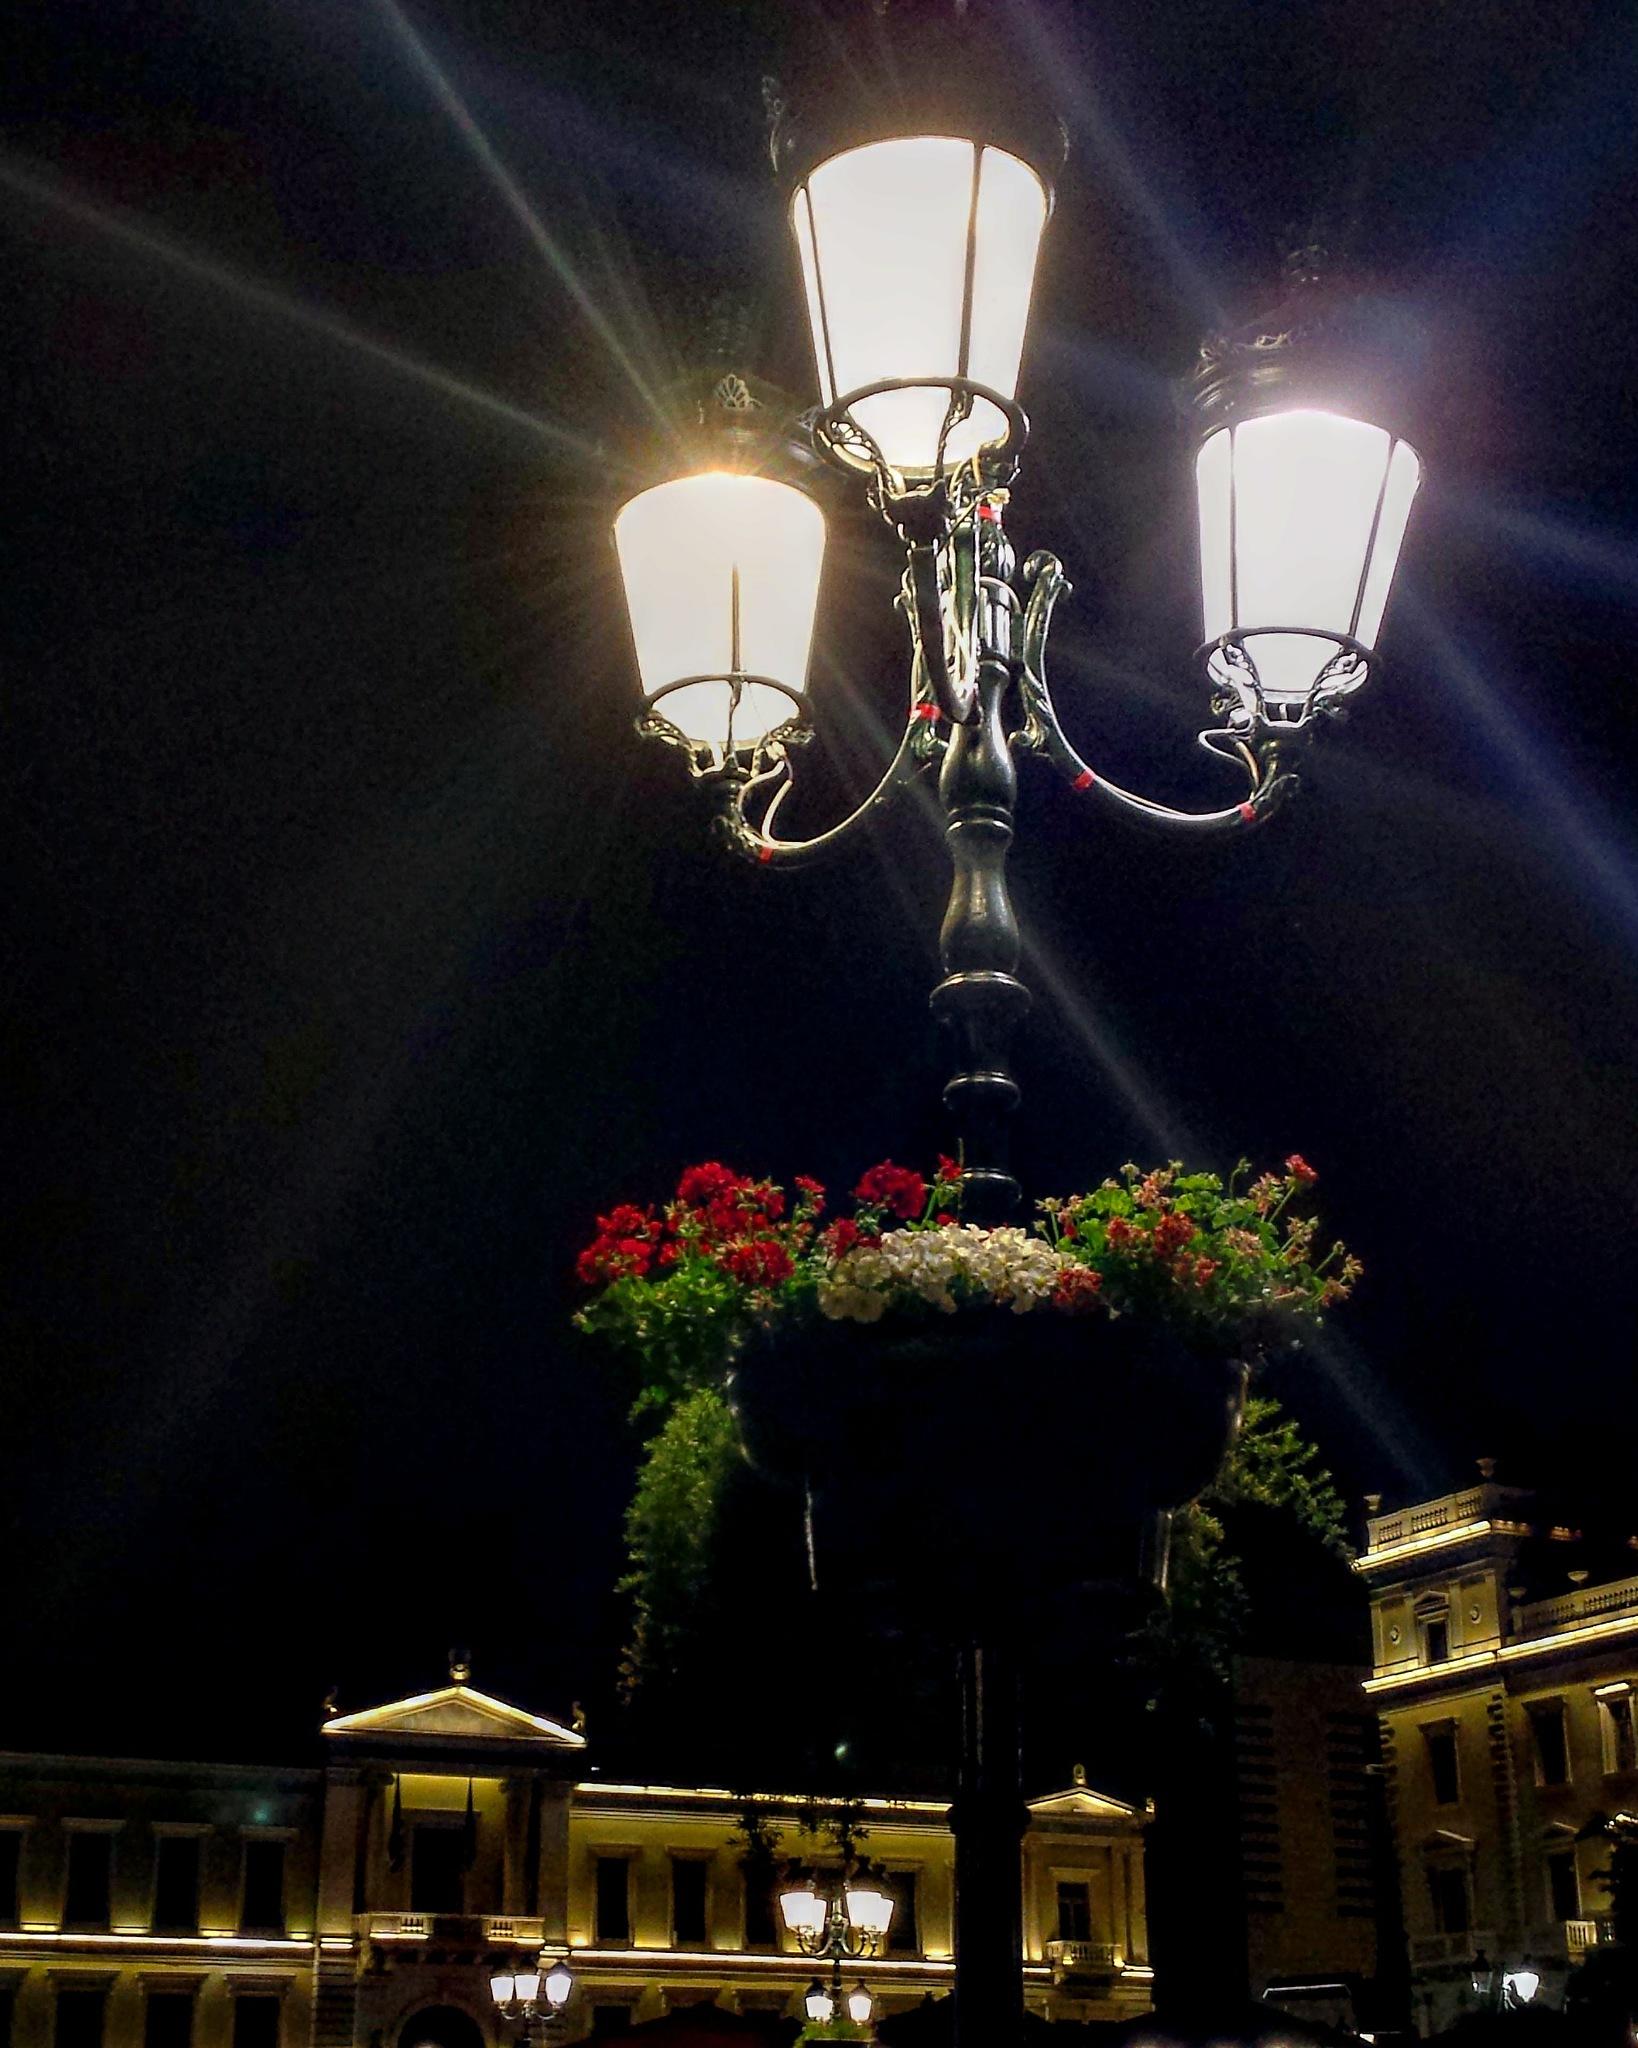 Lights by Stefan Stathopoulos